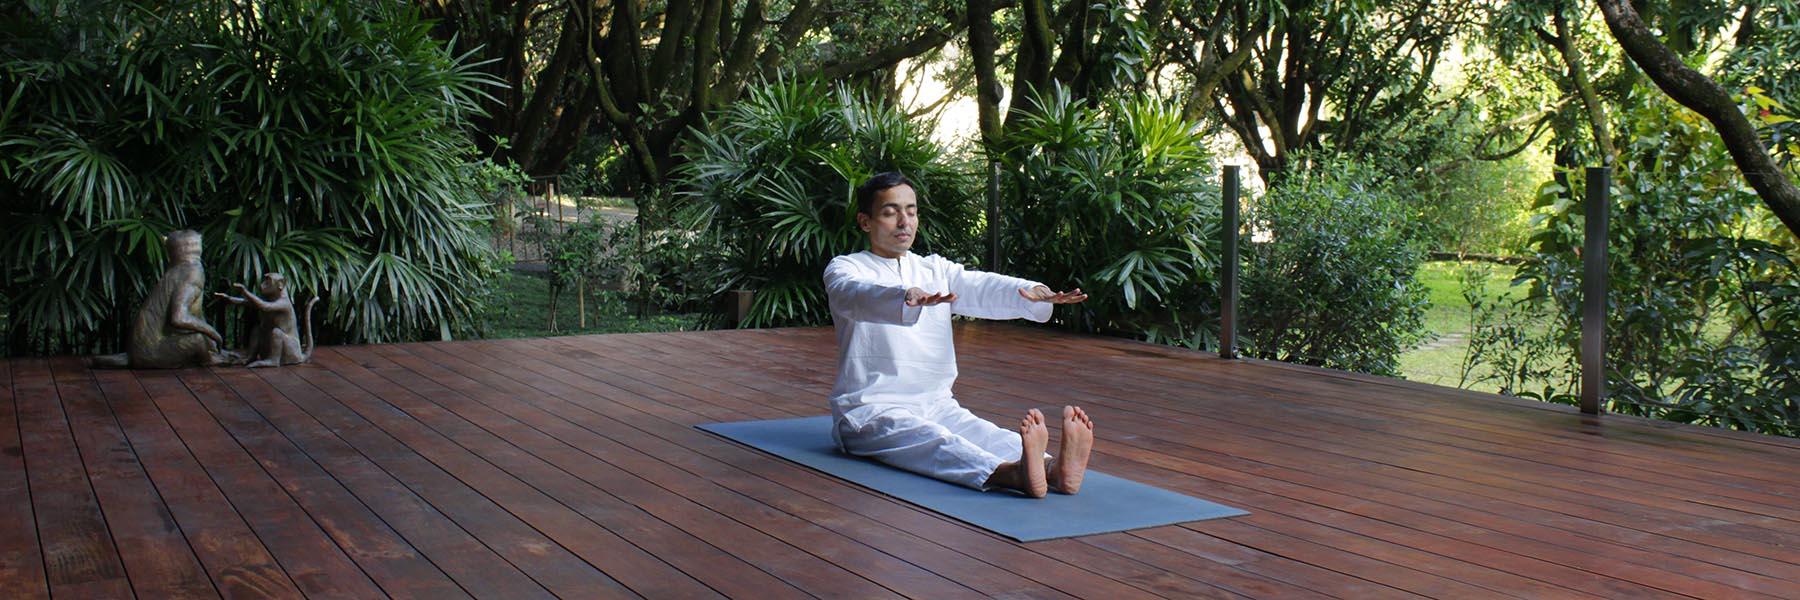 Wellness tours of India